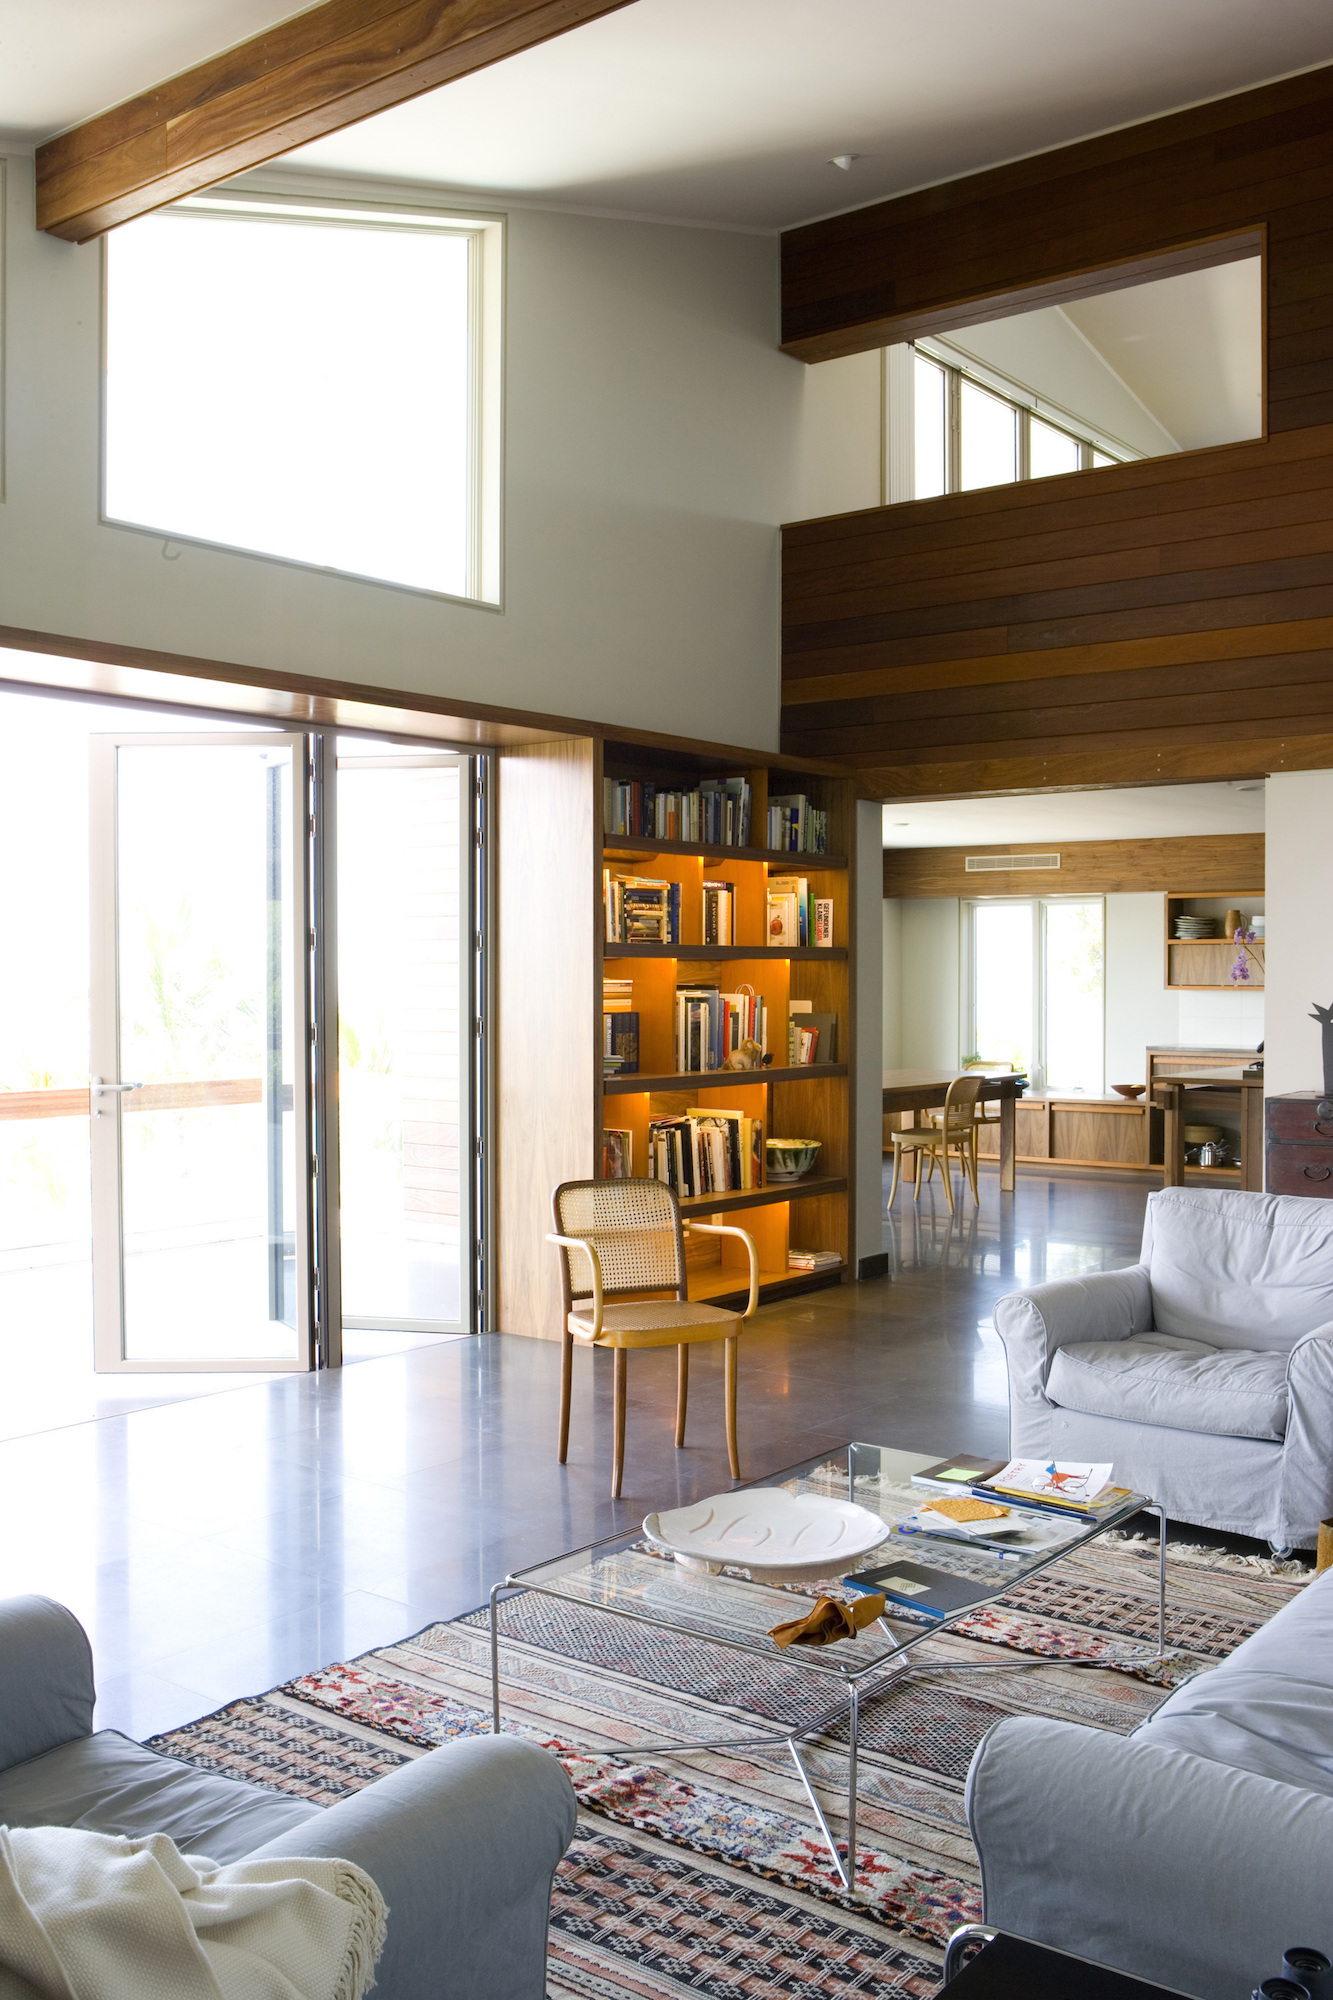 residencia-tavernier-drive-luis-pons-design-lab_eric_carle_060407_040